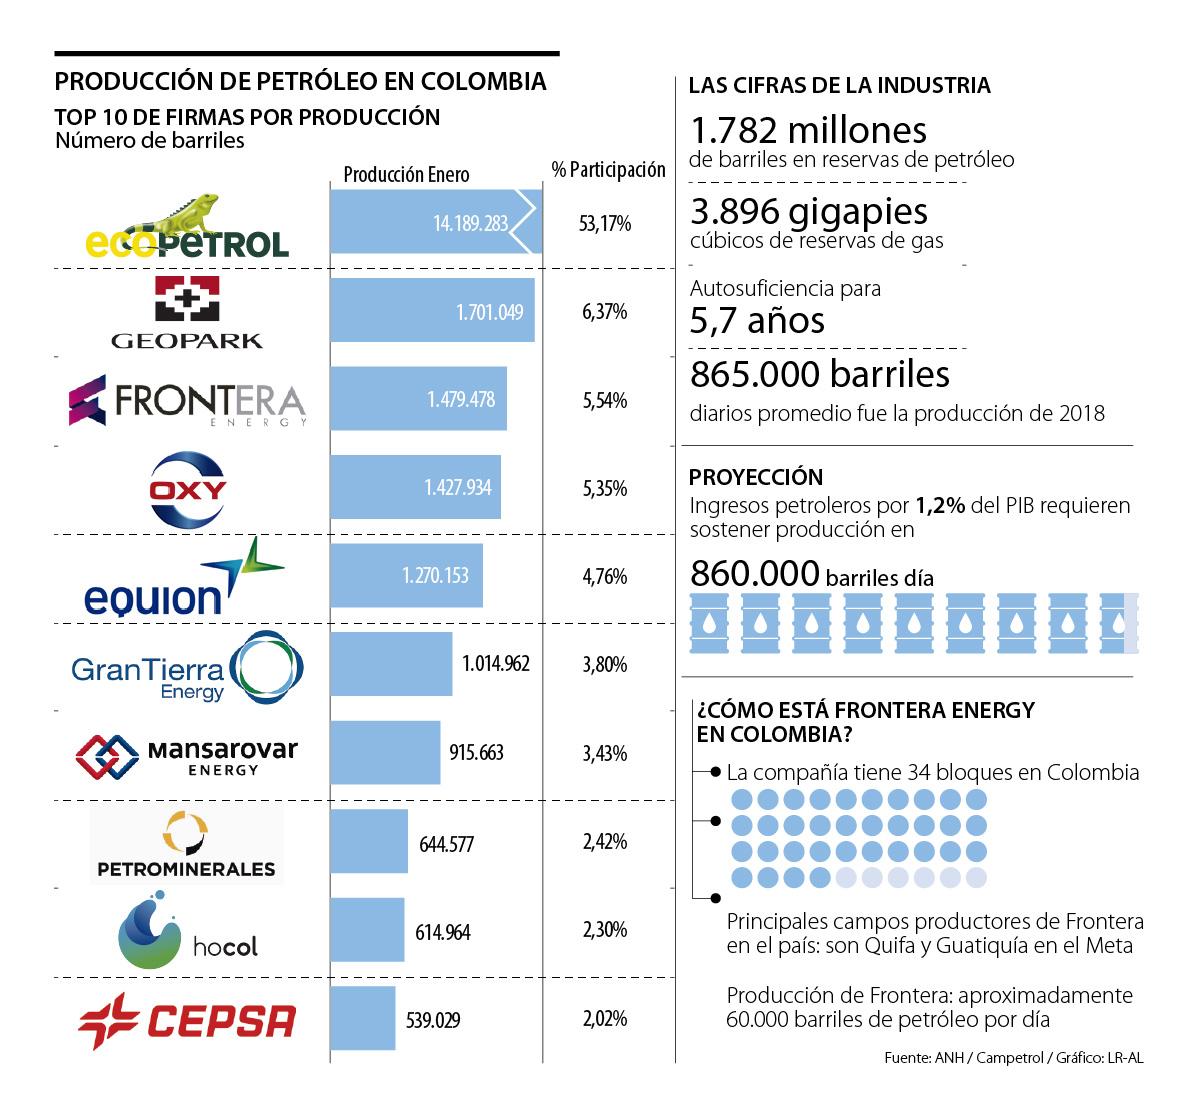 5a7fc5fa6f https://www.larepublica.co/analisis/jorge-hernan-pelaez-500047/traten ...